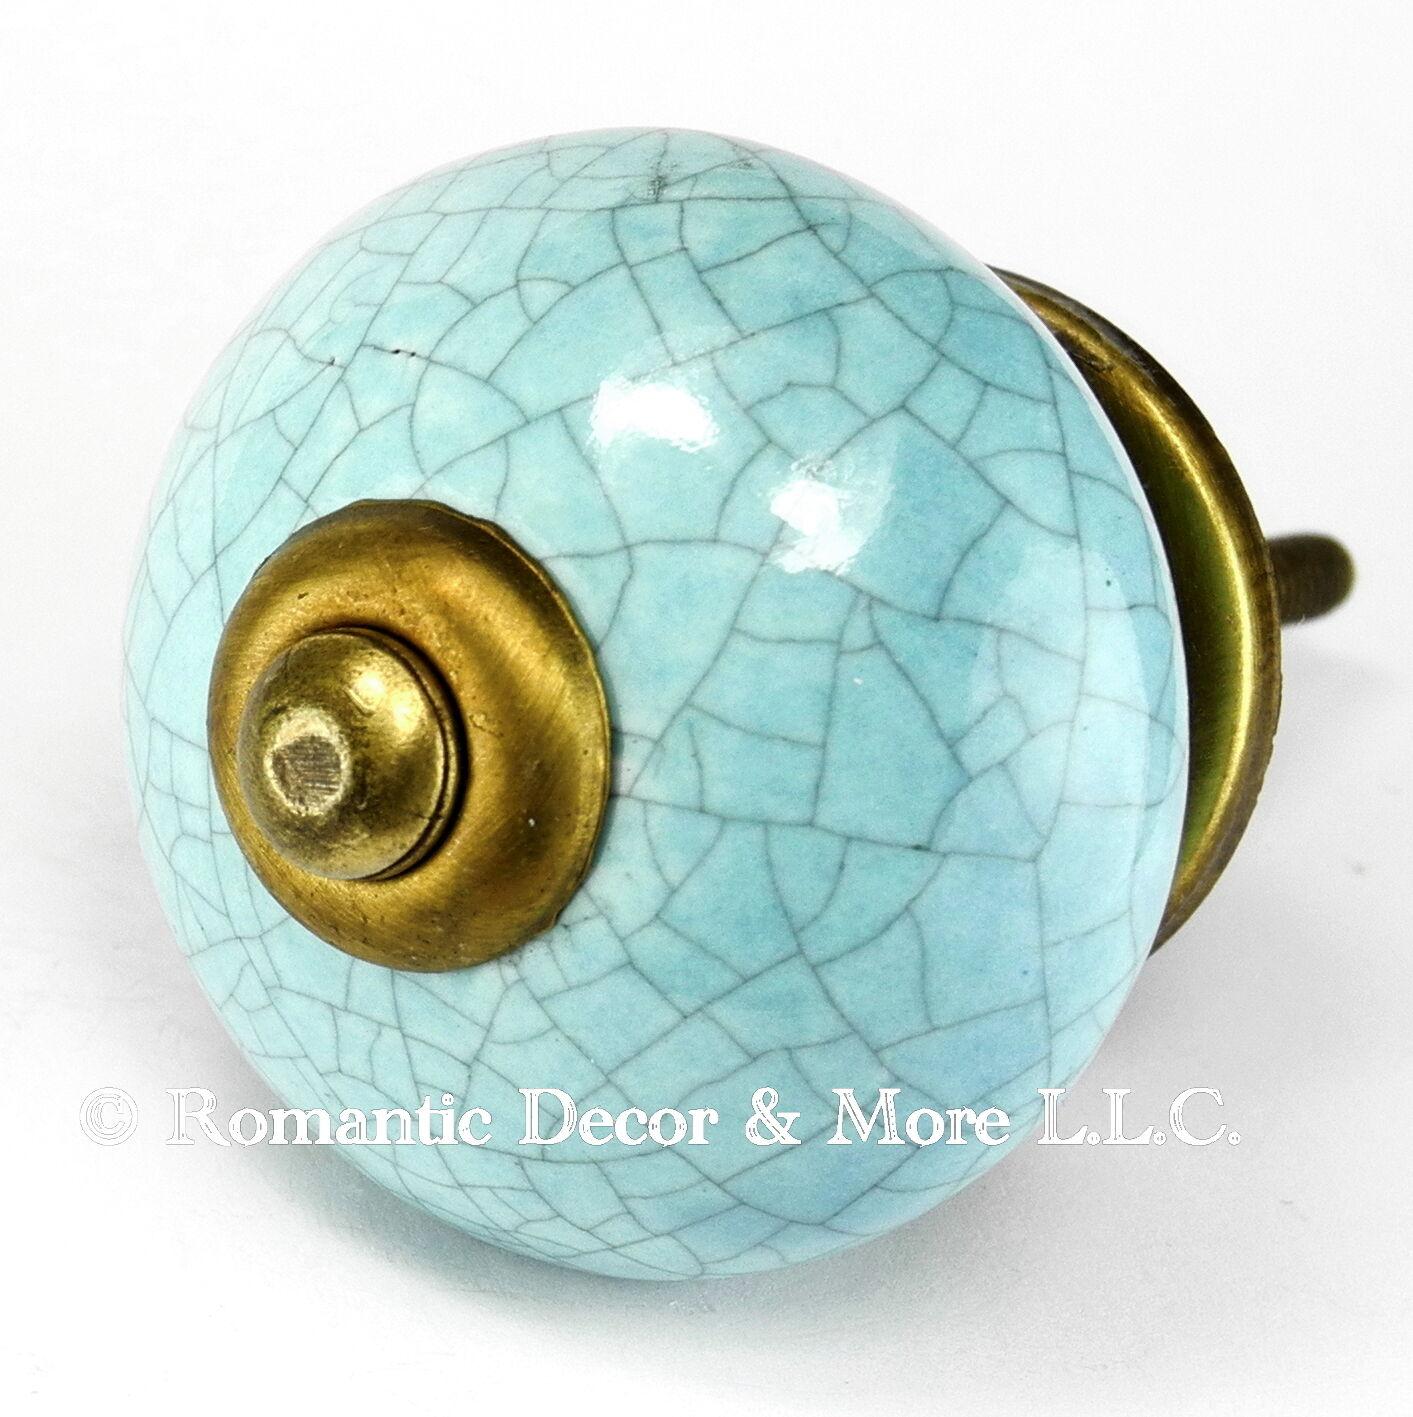 Vintage Ceramic Cabinet Knob, Drawer Pull Hardware or Cupboard Door Knob  C120RR